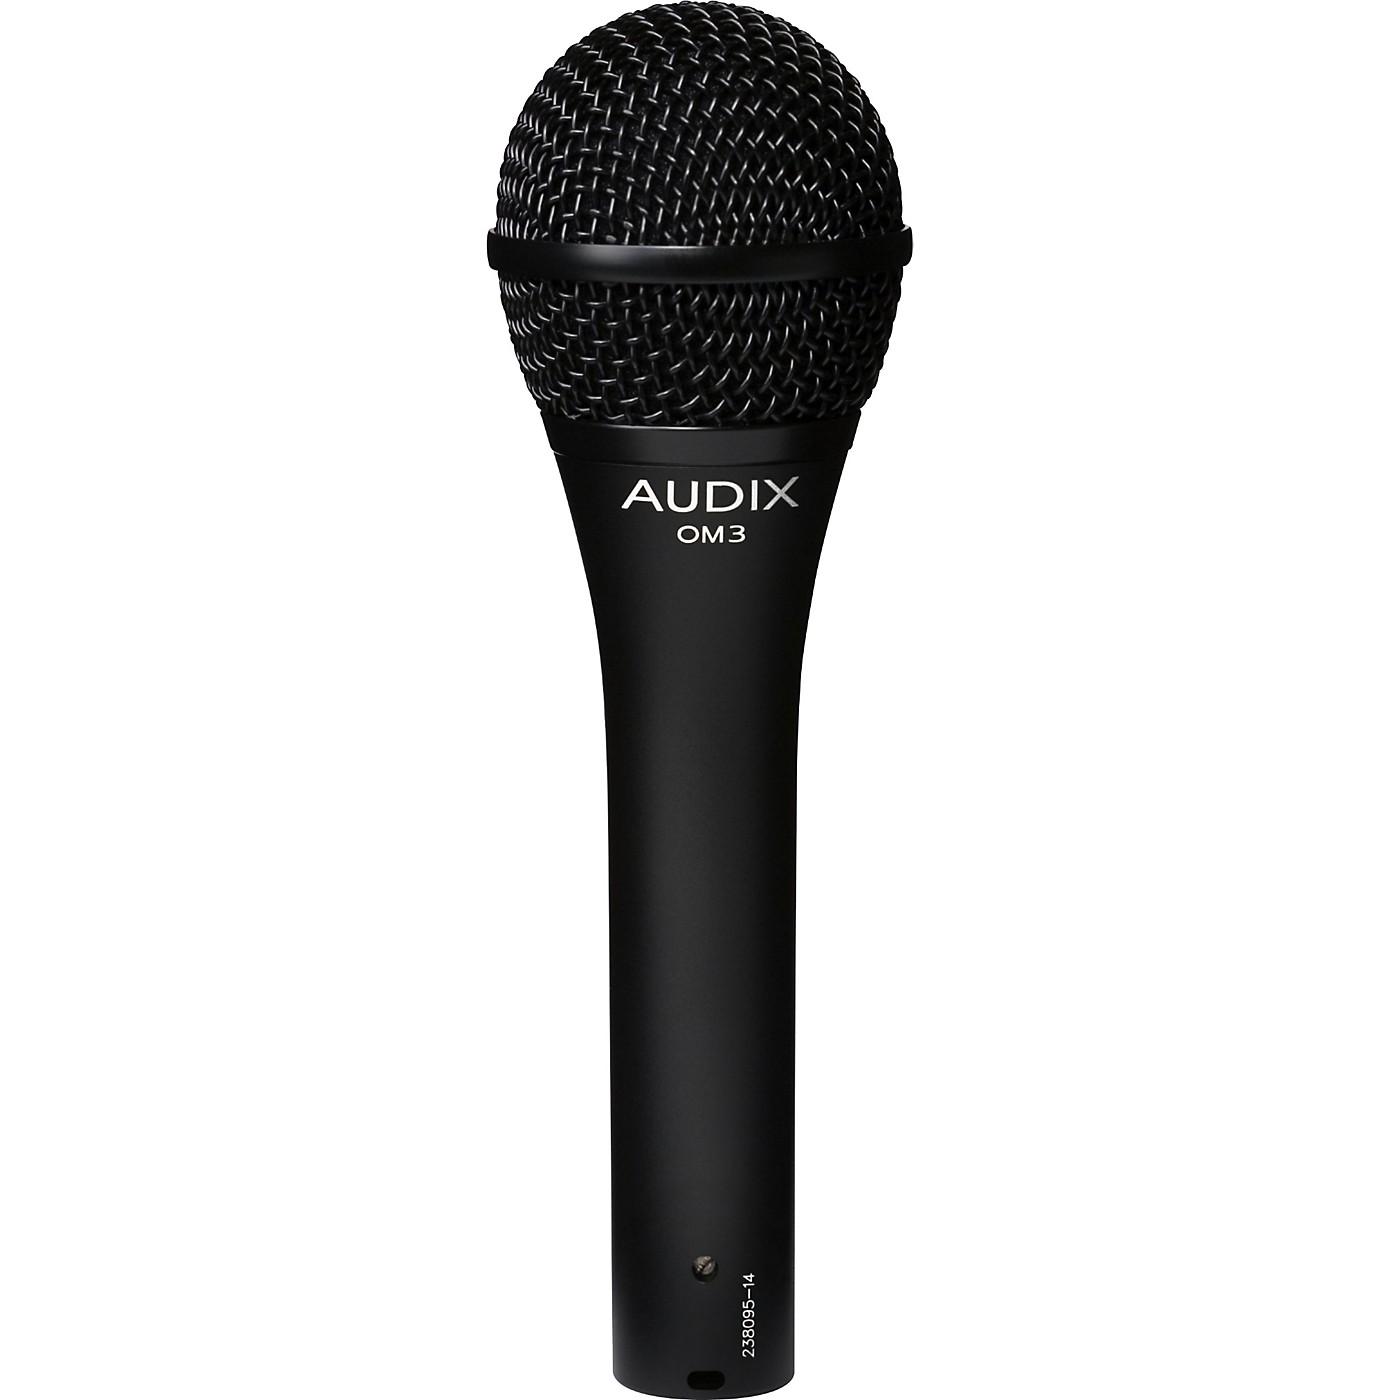 Audix OM3 Hypercardioid Vocal Microphone thumbnail